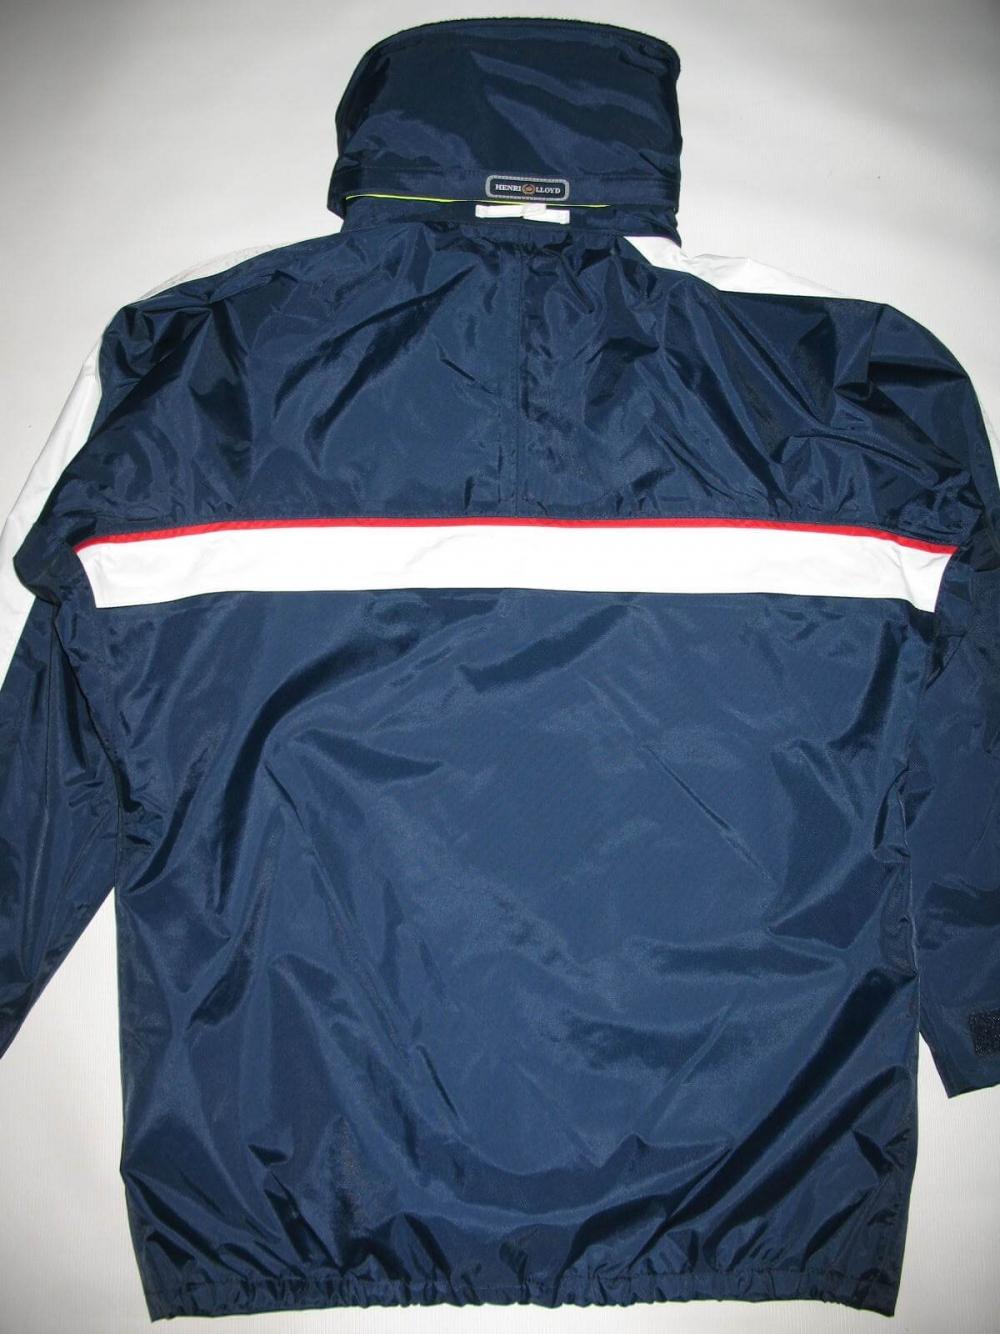 Куртка HENRI LLOYD CT1000 Yachting Jacket (размер S) - 2